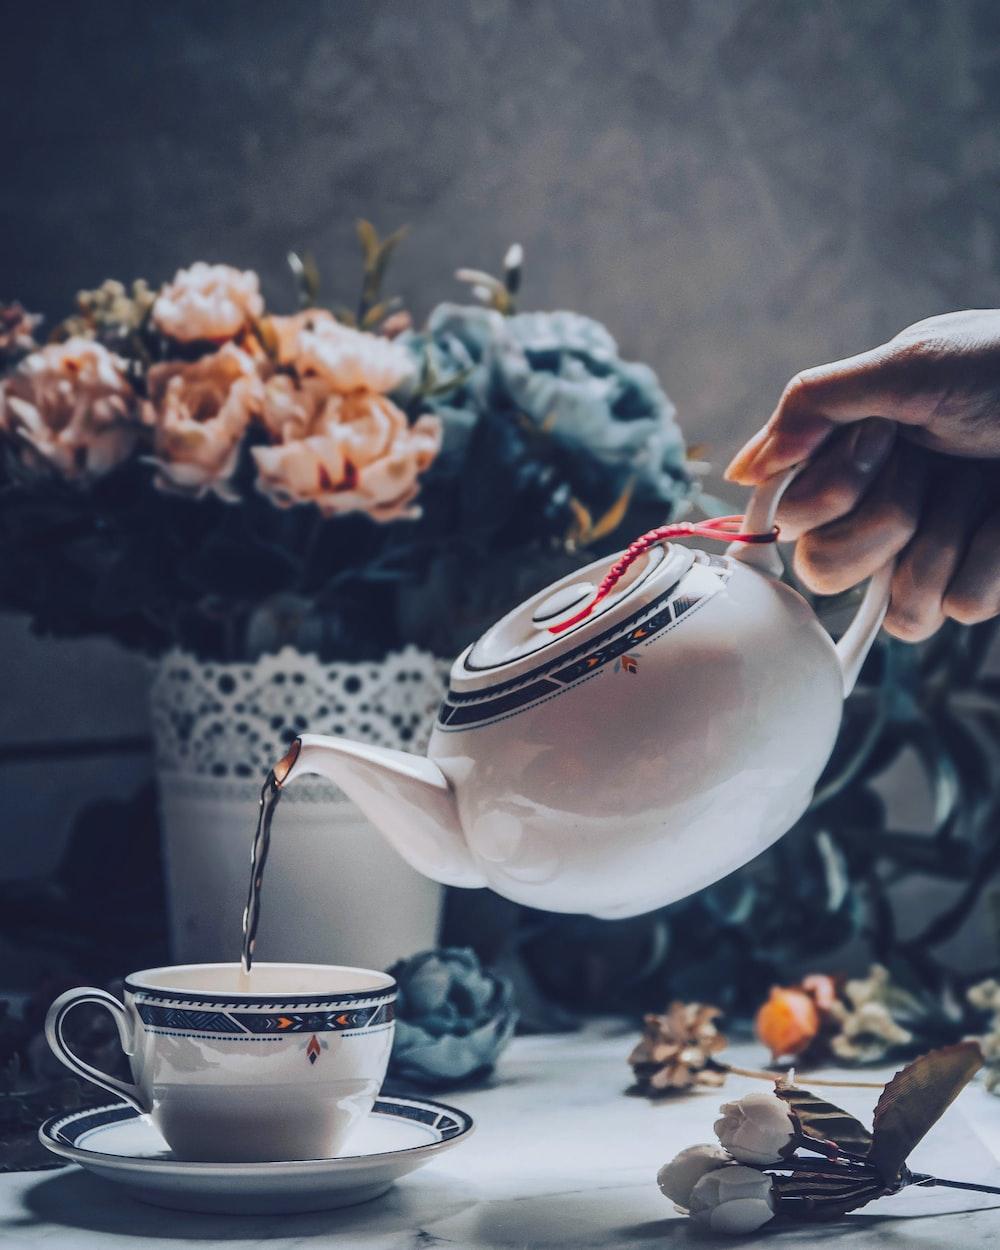 person holding white ceramic teapot